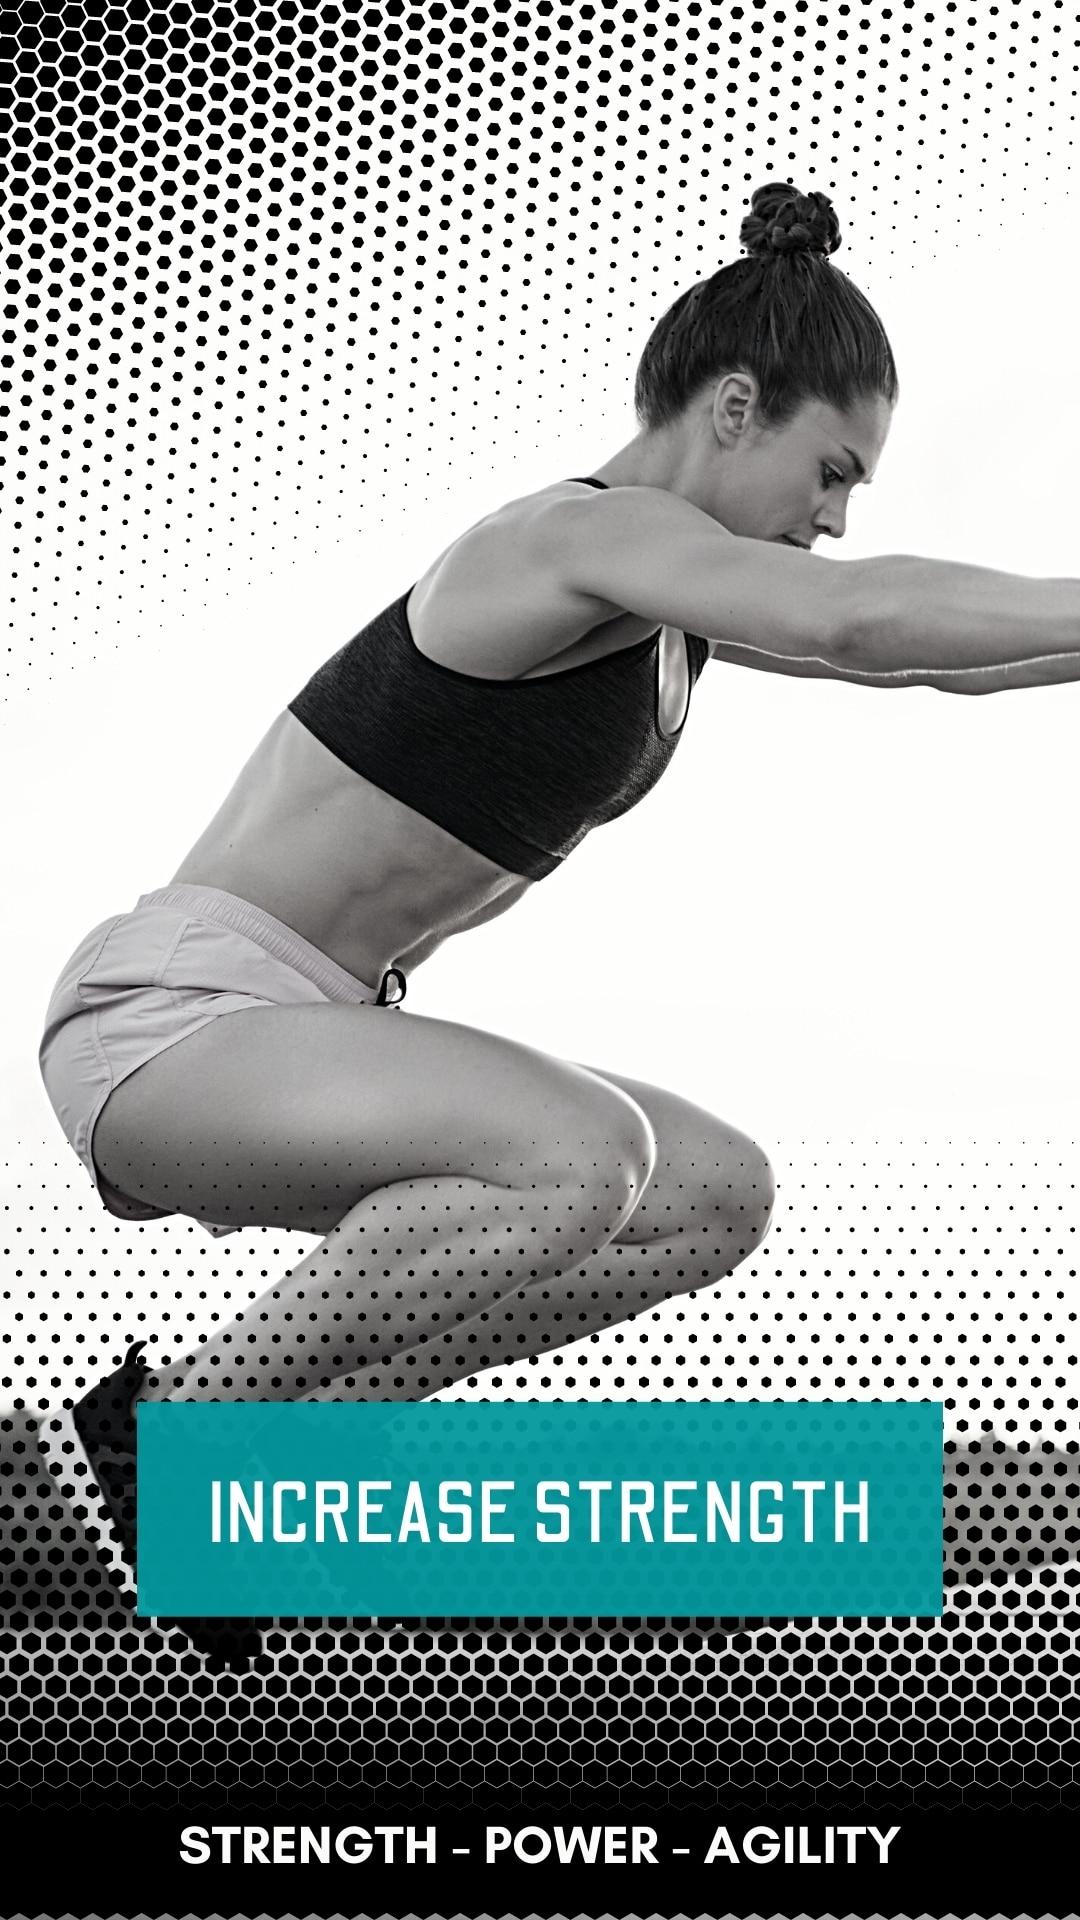 sports performance and training athletes